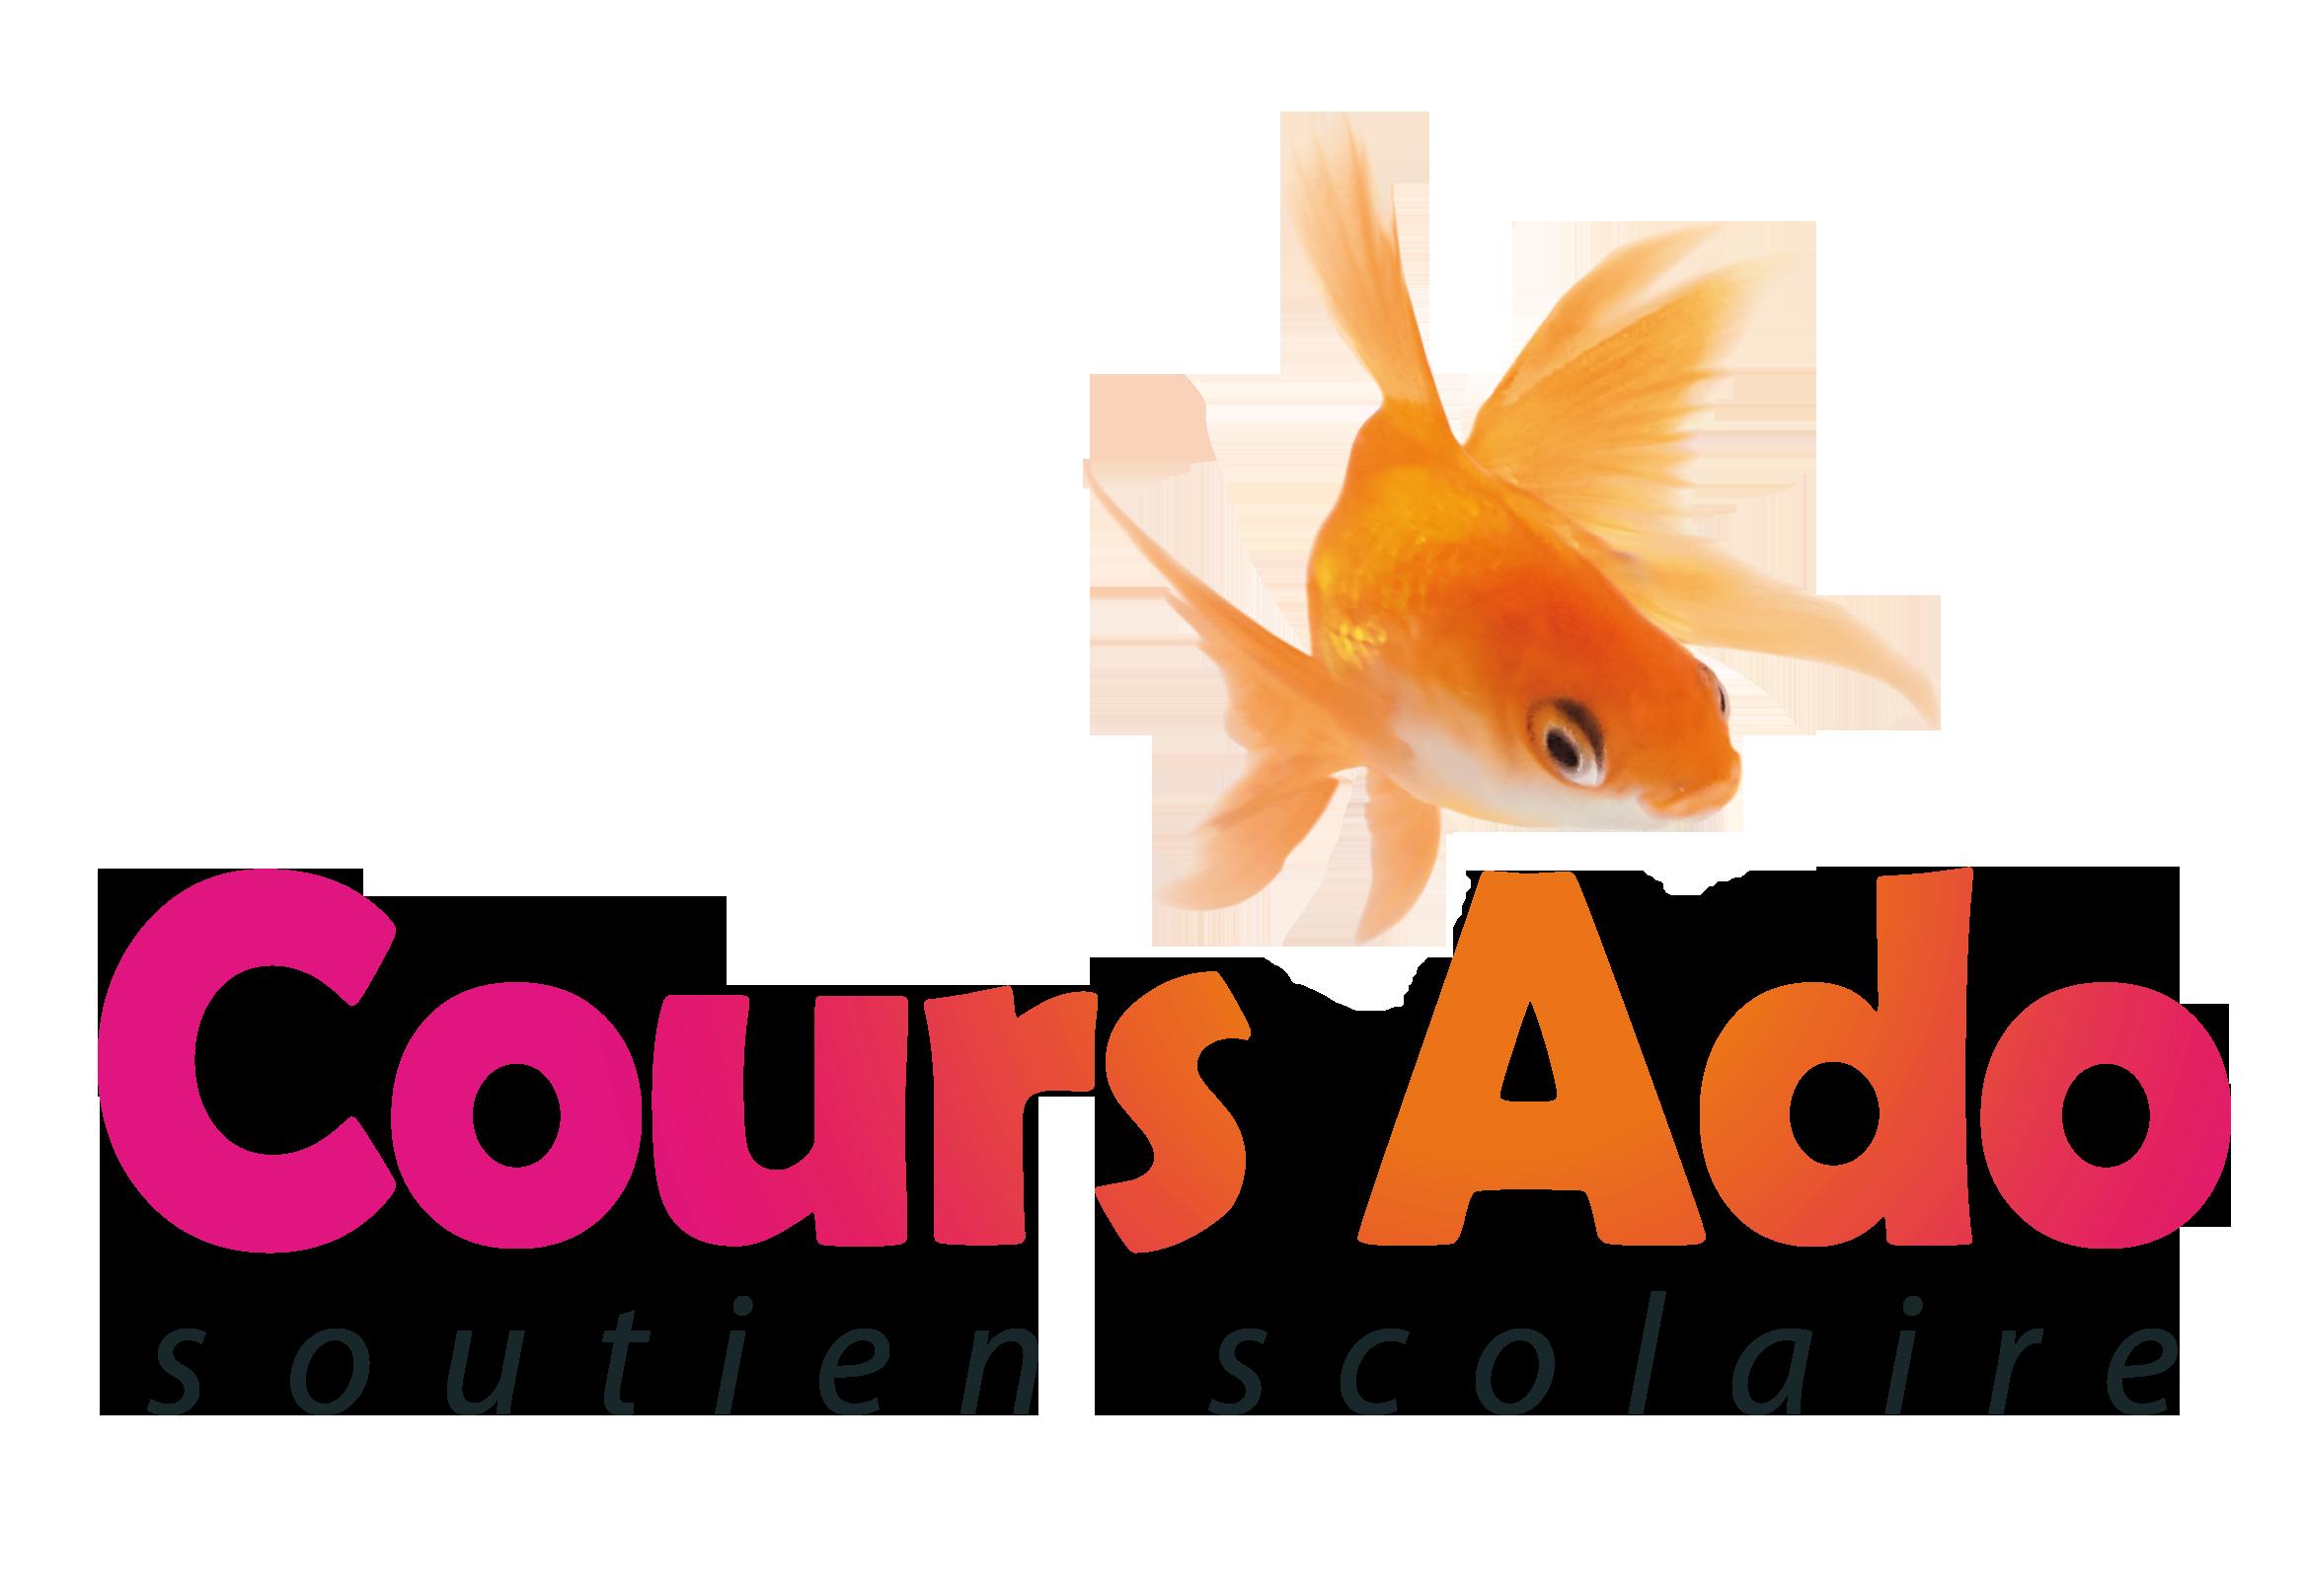 logo cours ado soutien scolaire